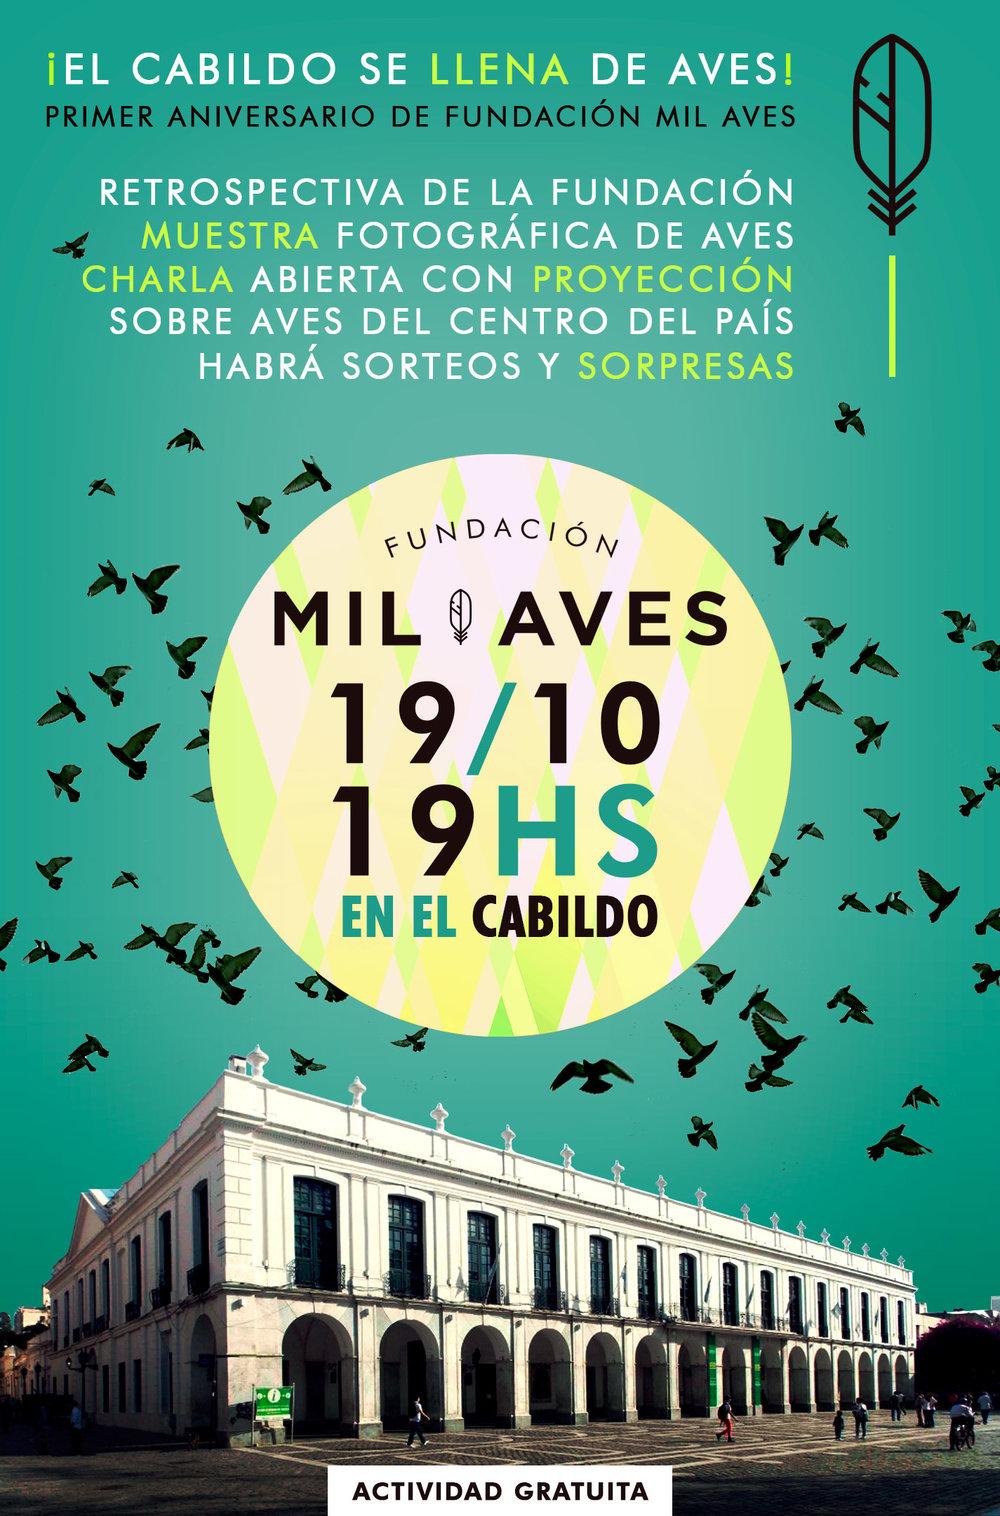 flyer-aniversario-cabildo3.jpg